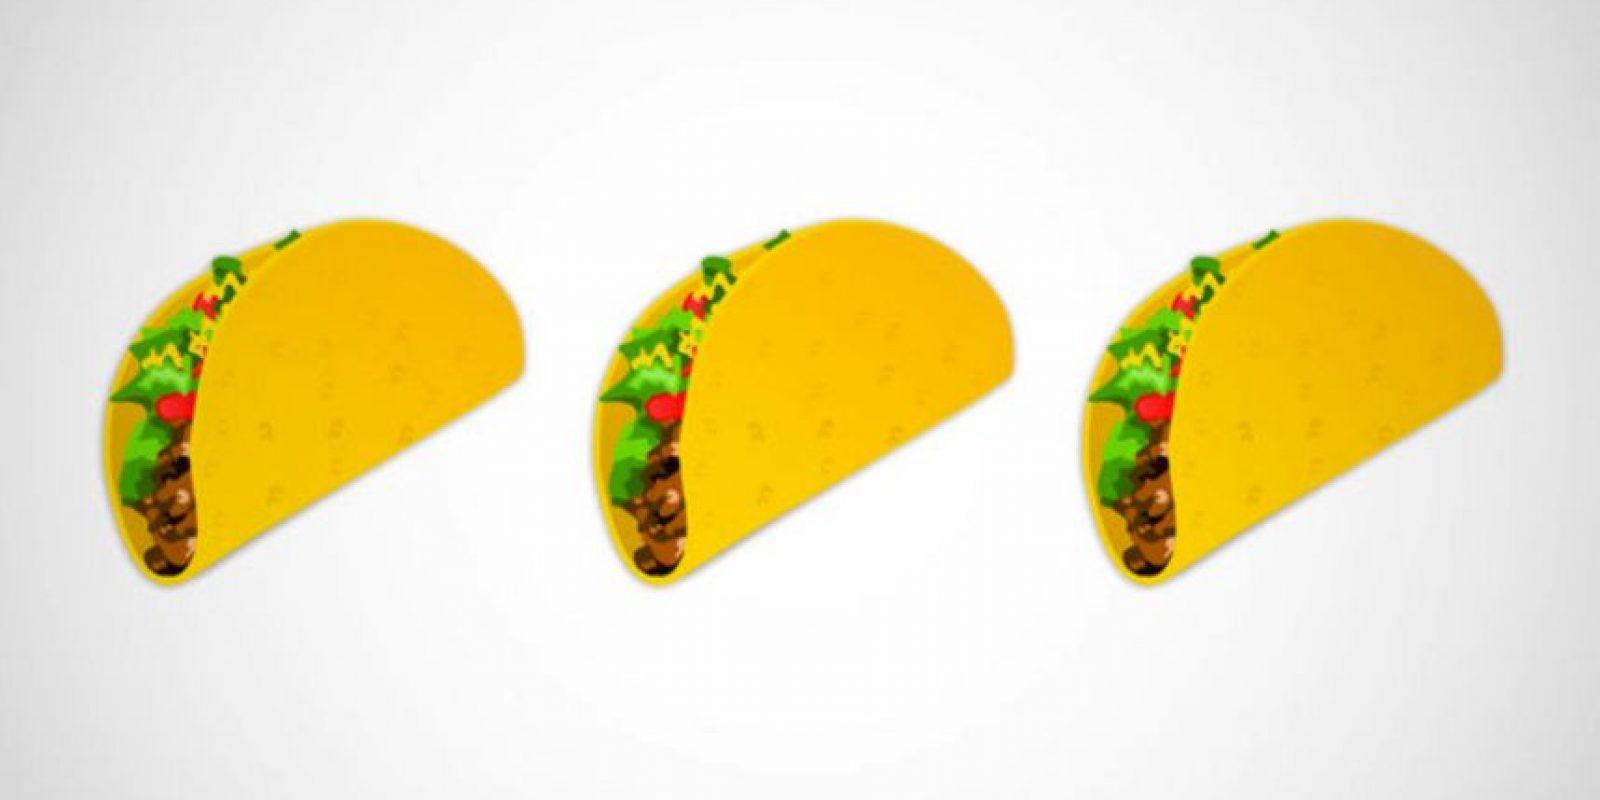 Taco Foto:Emojipedia